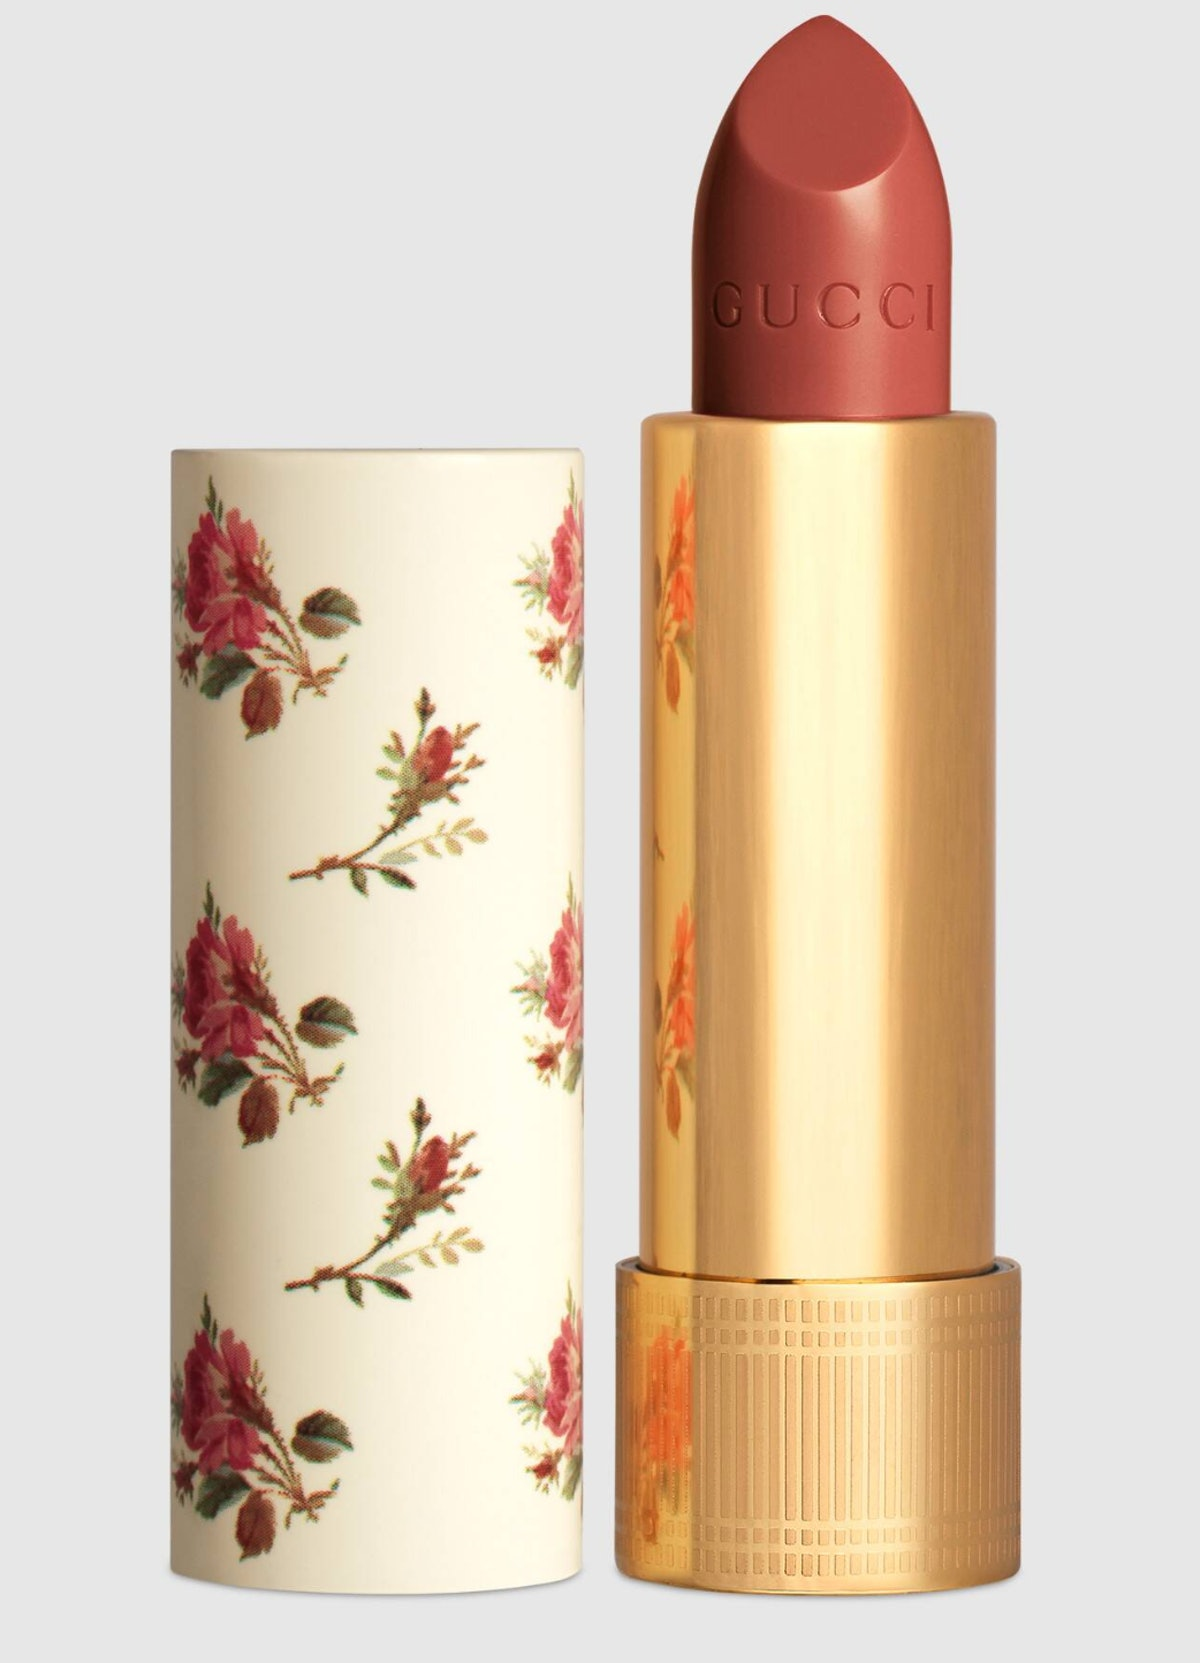 Gucci Beauty Rouge à Lèvres Voile Lipstick in The Painted Veil